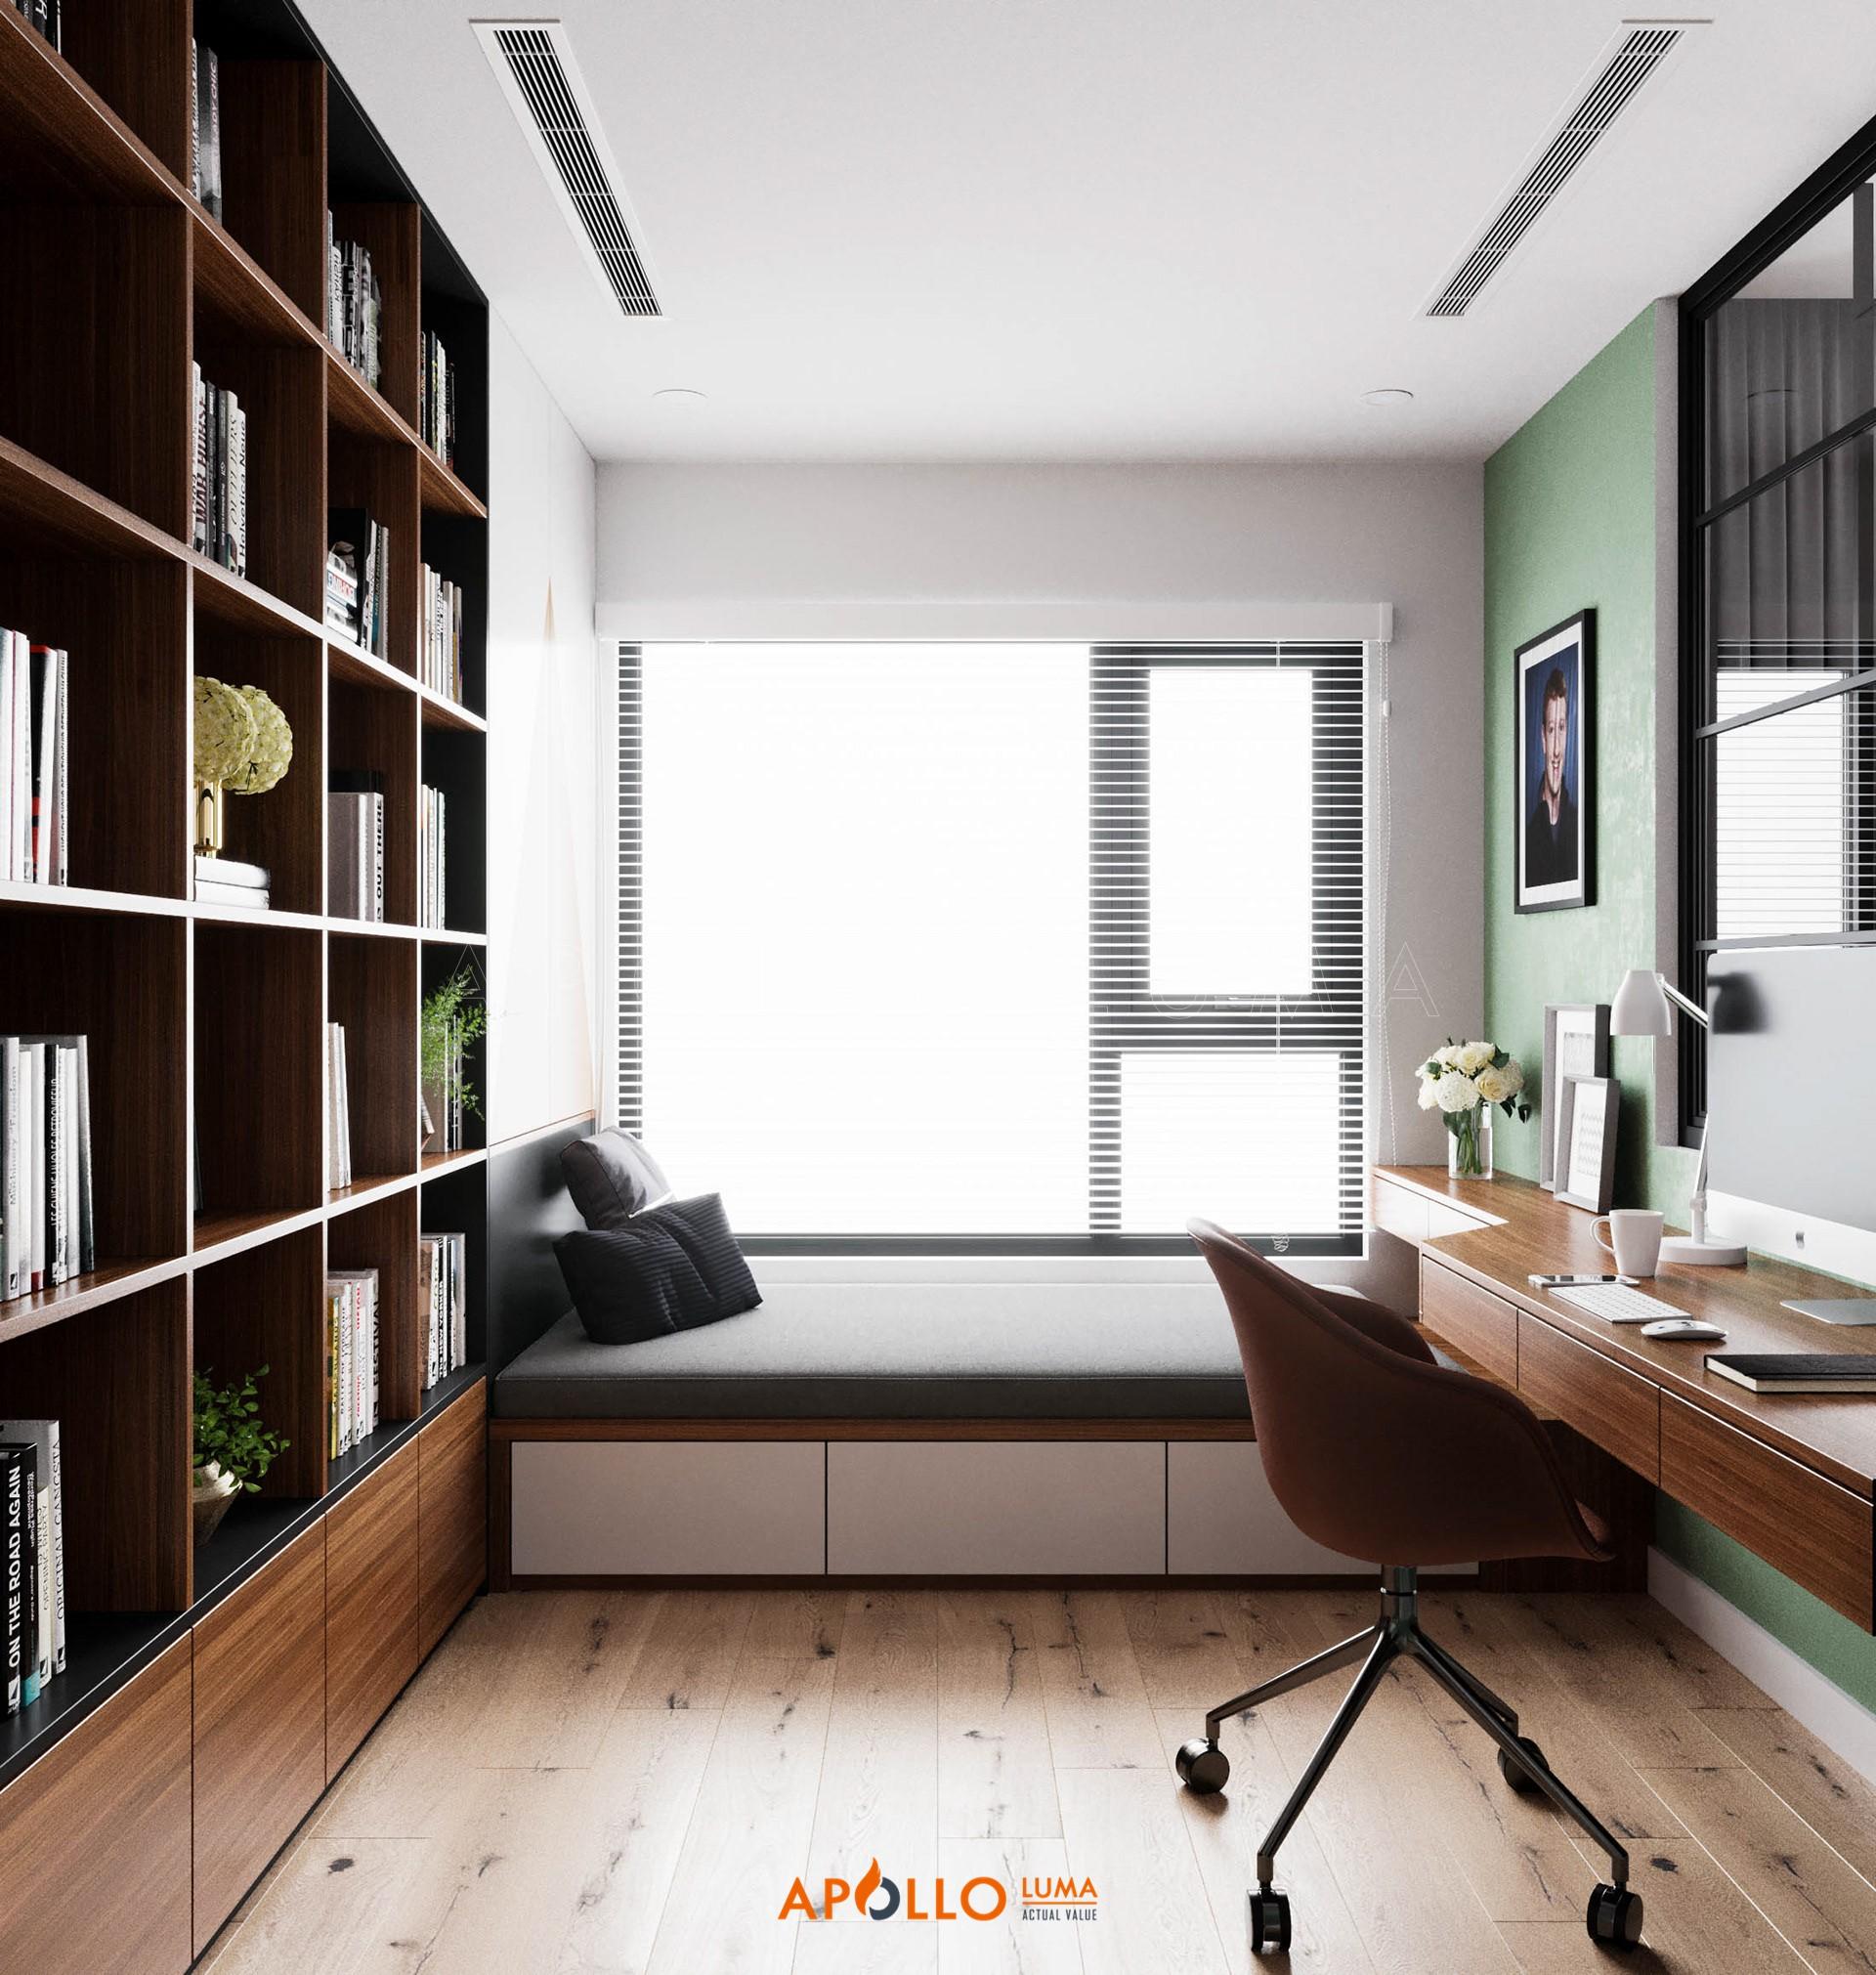 Thiết kế nội thất căn 2PN+1 (65m2) S1.10-05 Vinhomes Ocean Park